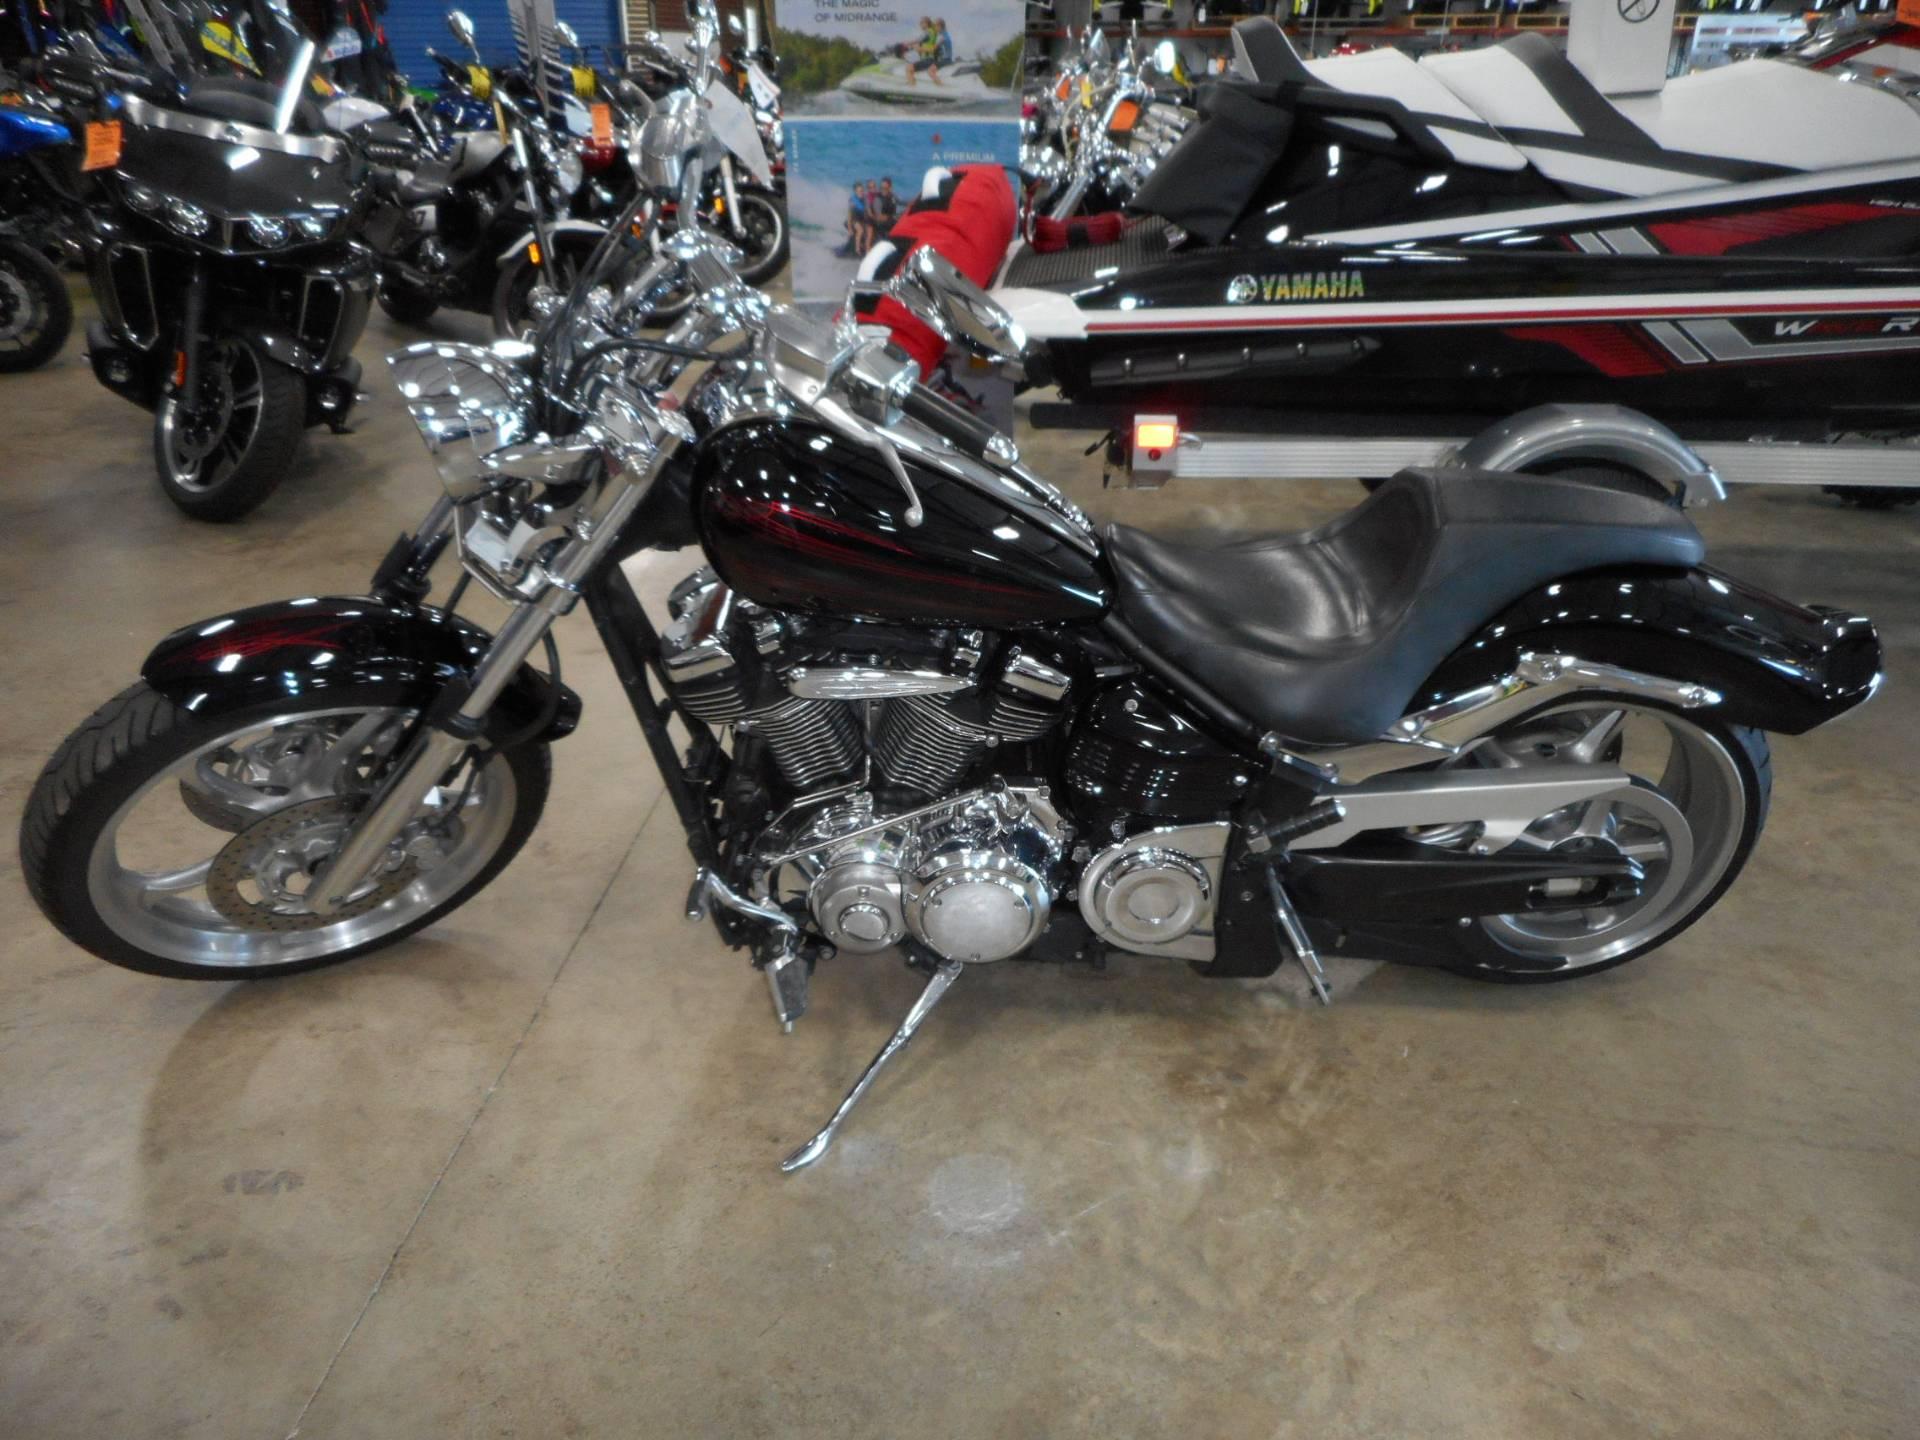 Motorcycle IL Planet-7: description, specifications, photos 92